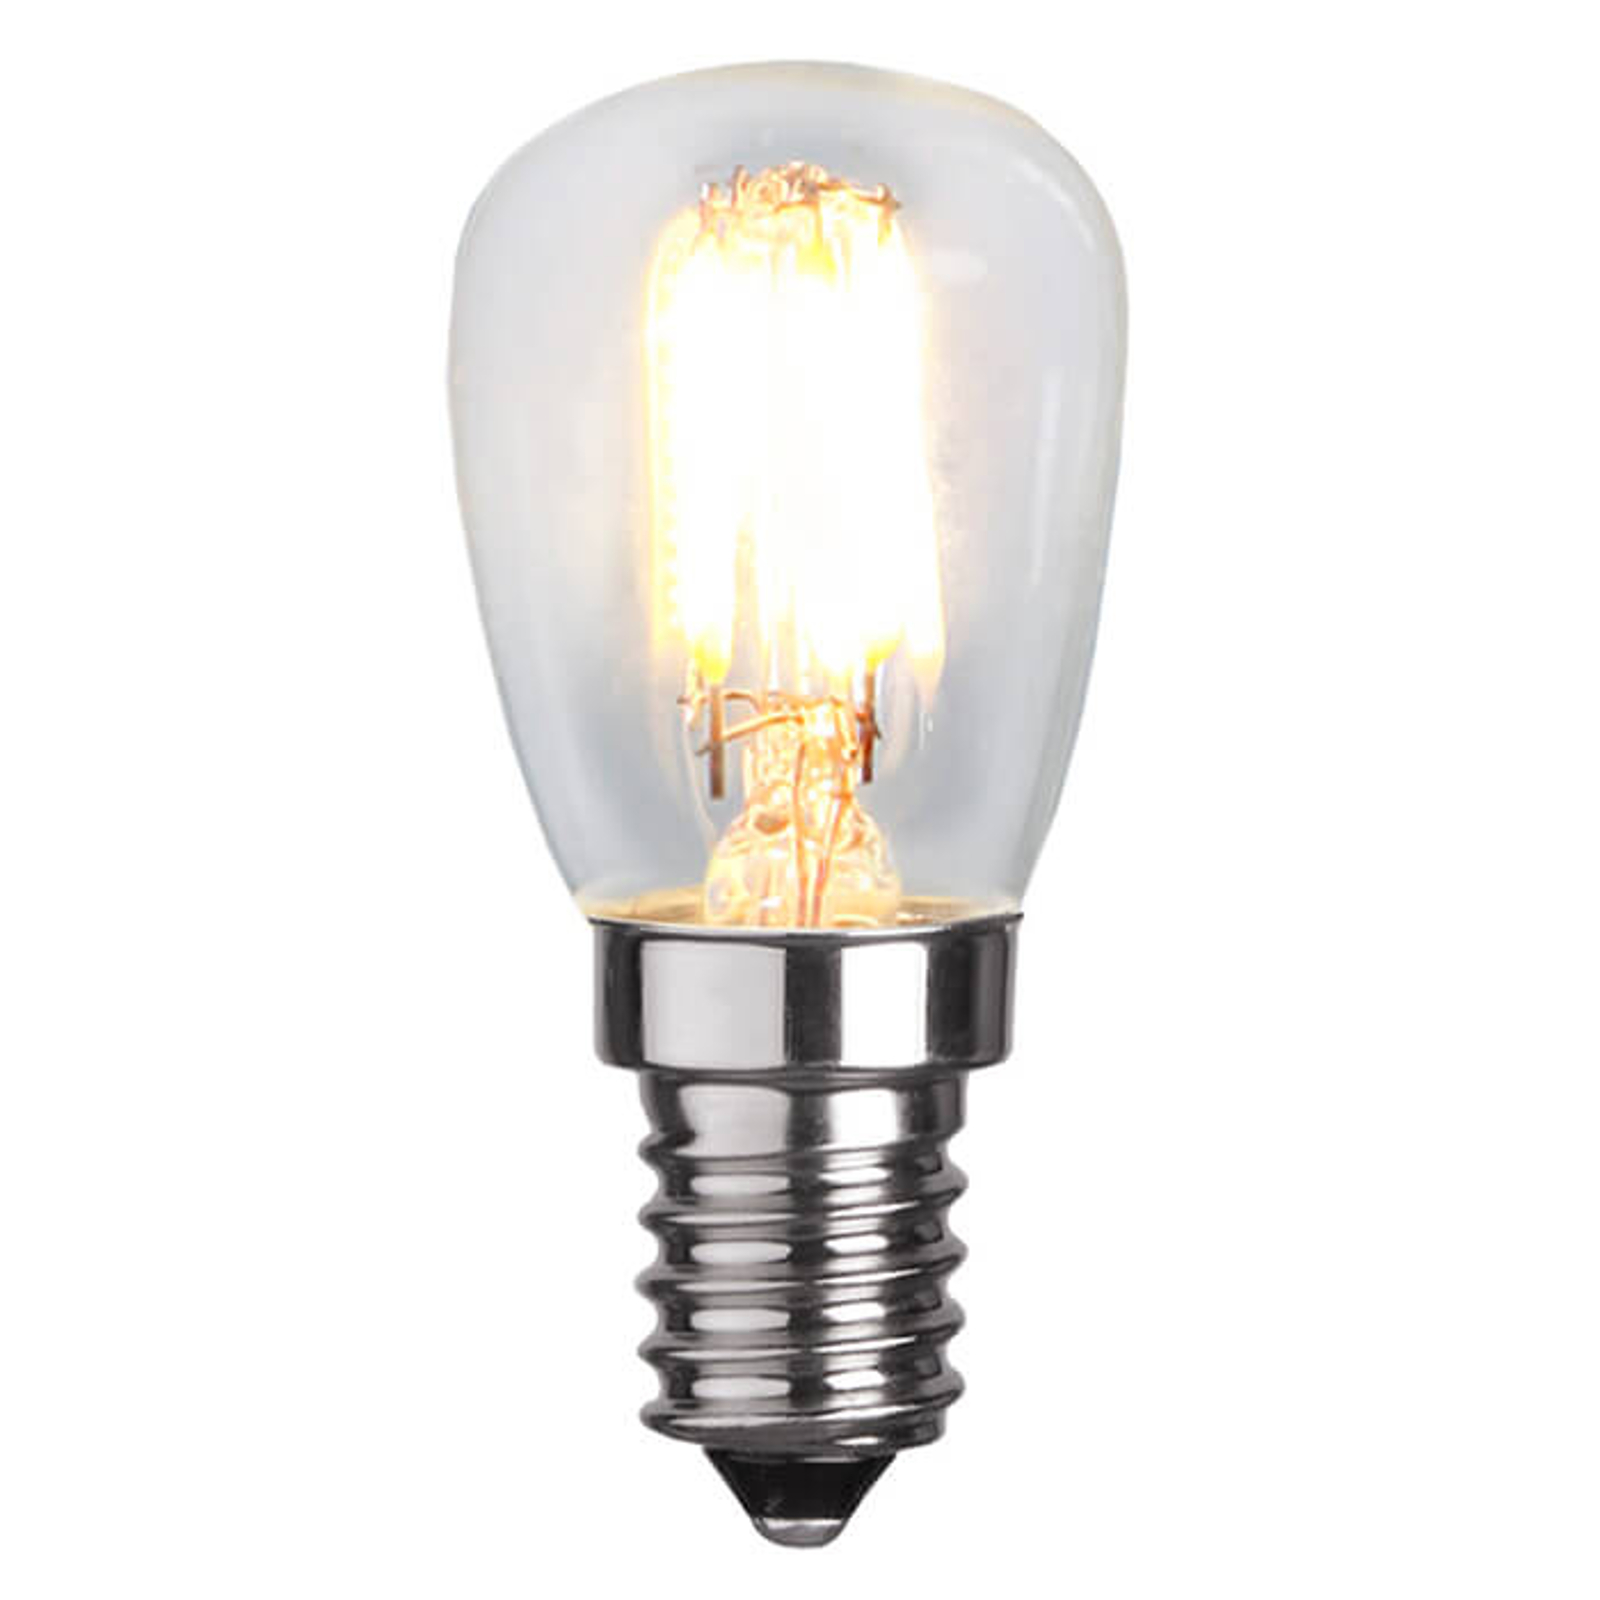 E14 2,8W 827 ampoule LED, dimmable